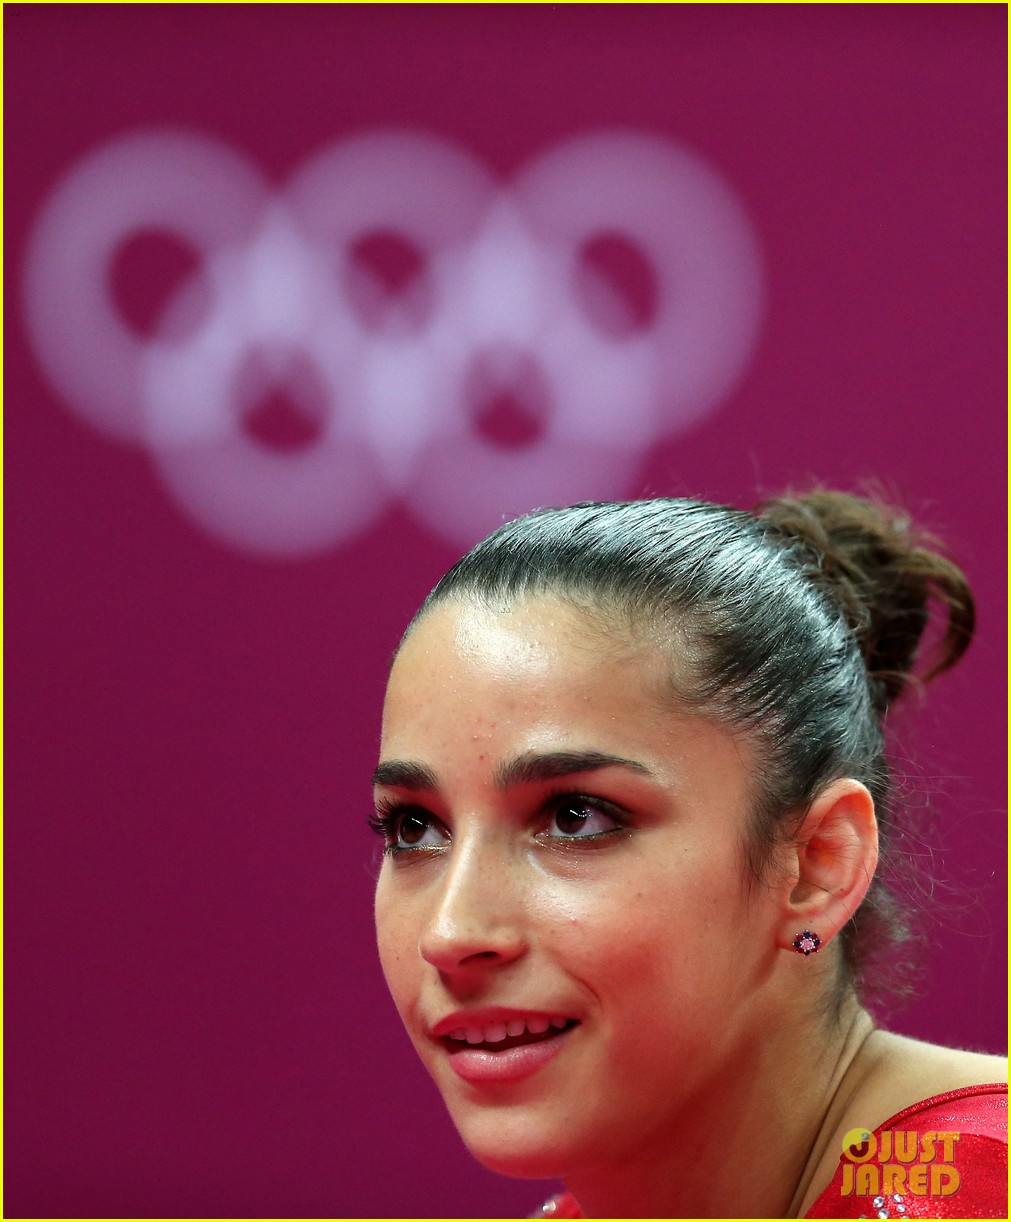 imagetwist.com lsm-03 U.S. Women's Gymnastics Team Wins Gold Medal!: Photo 2694844   2012 Summer  Olympics London, Aly Raisman, Gabby Douglas, Jordyn Wieber, Kyla Ross, ...